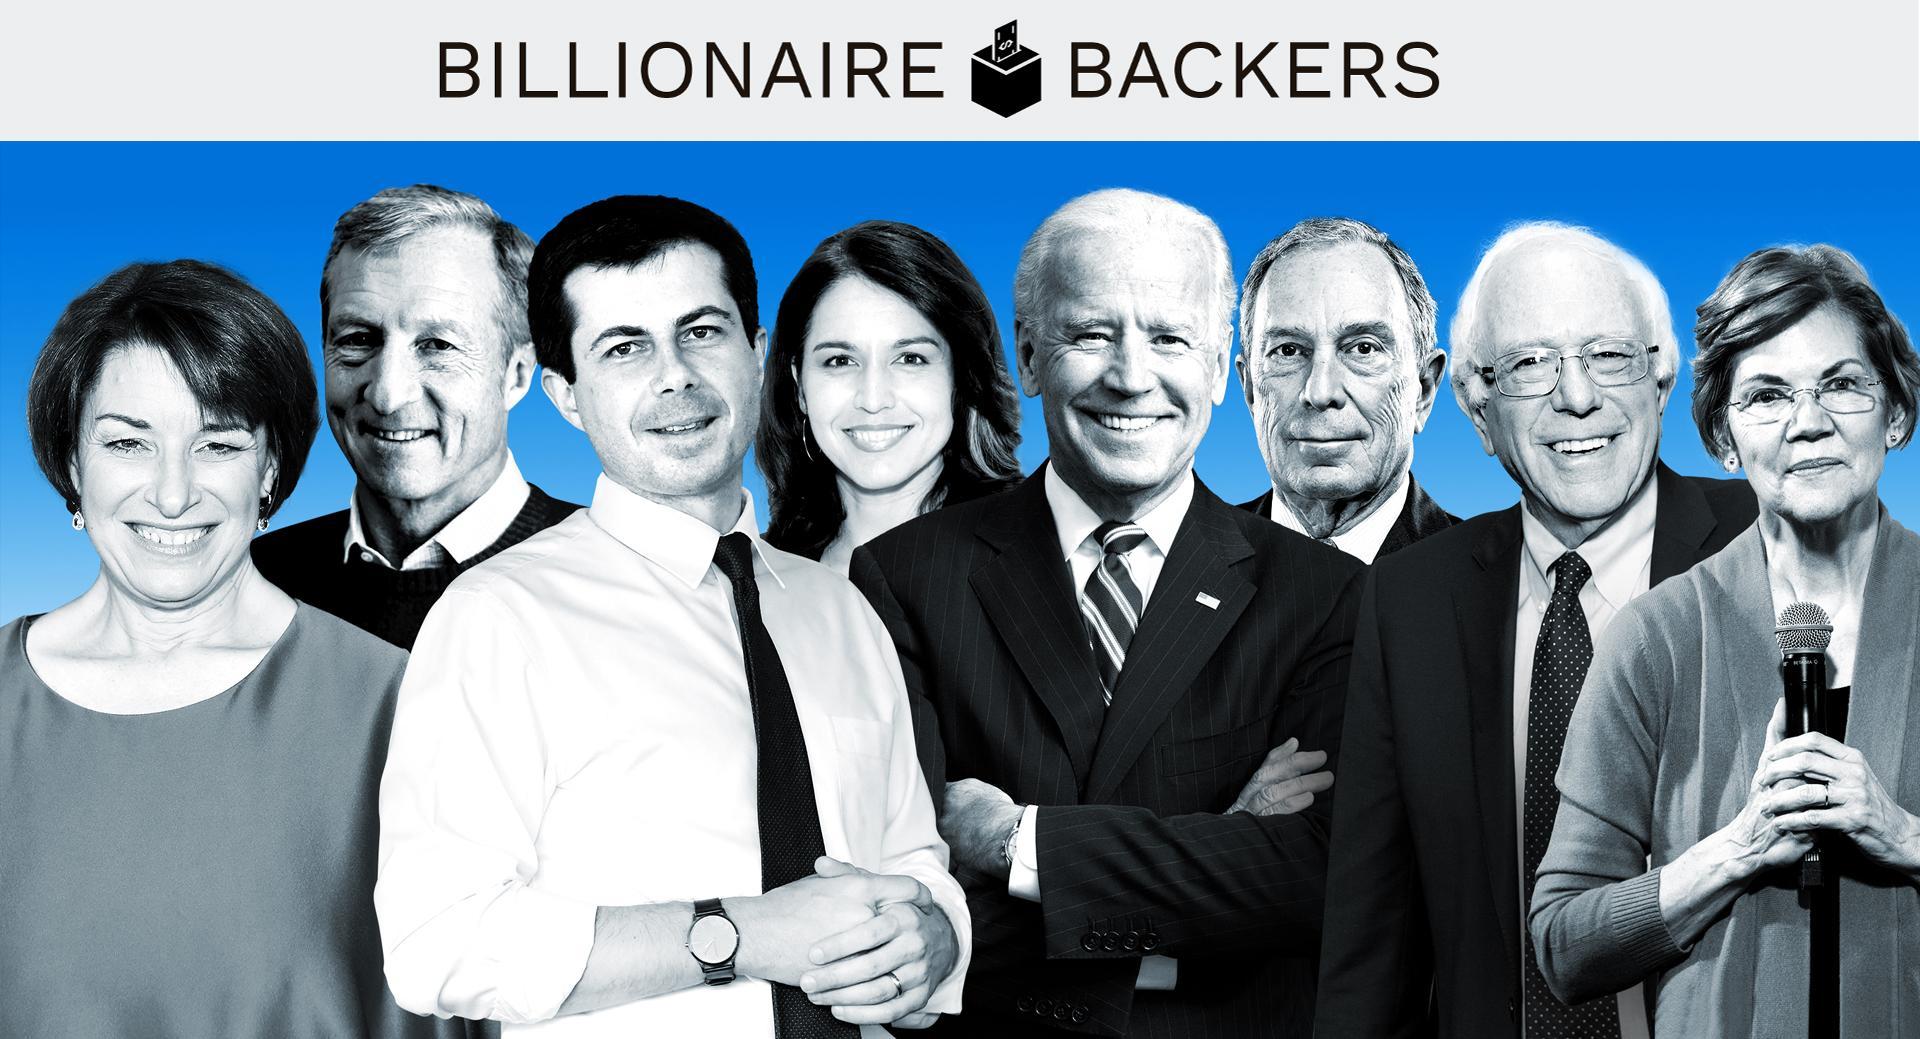 Biden Up To 60 Billionaire Donors While Buttigieg Hits 56. Bernie? Zero.